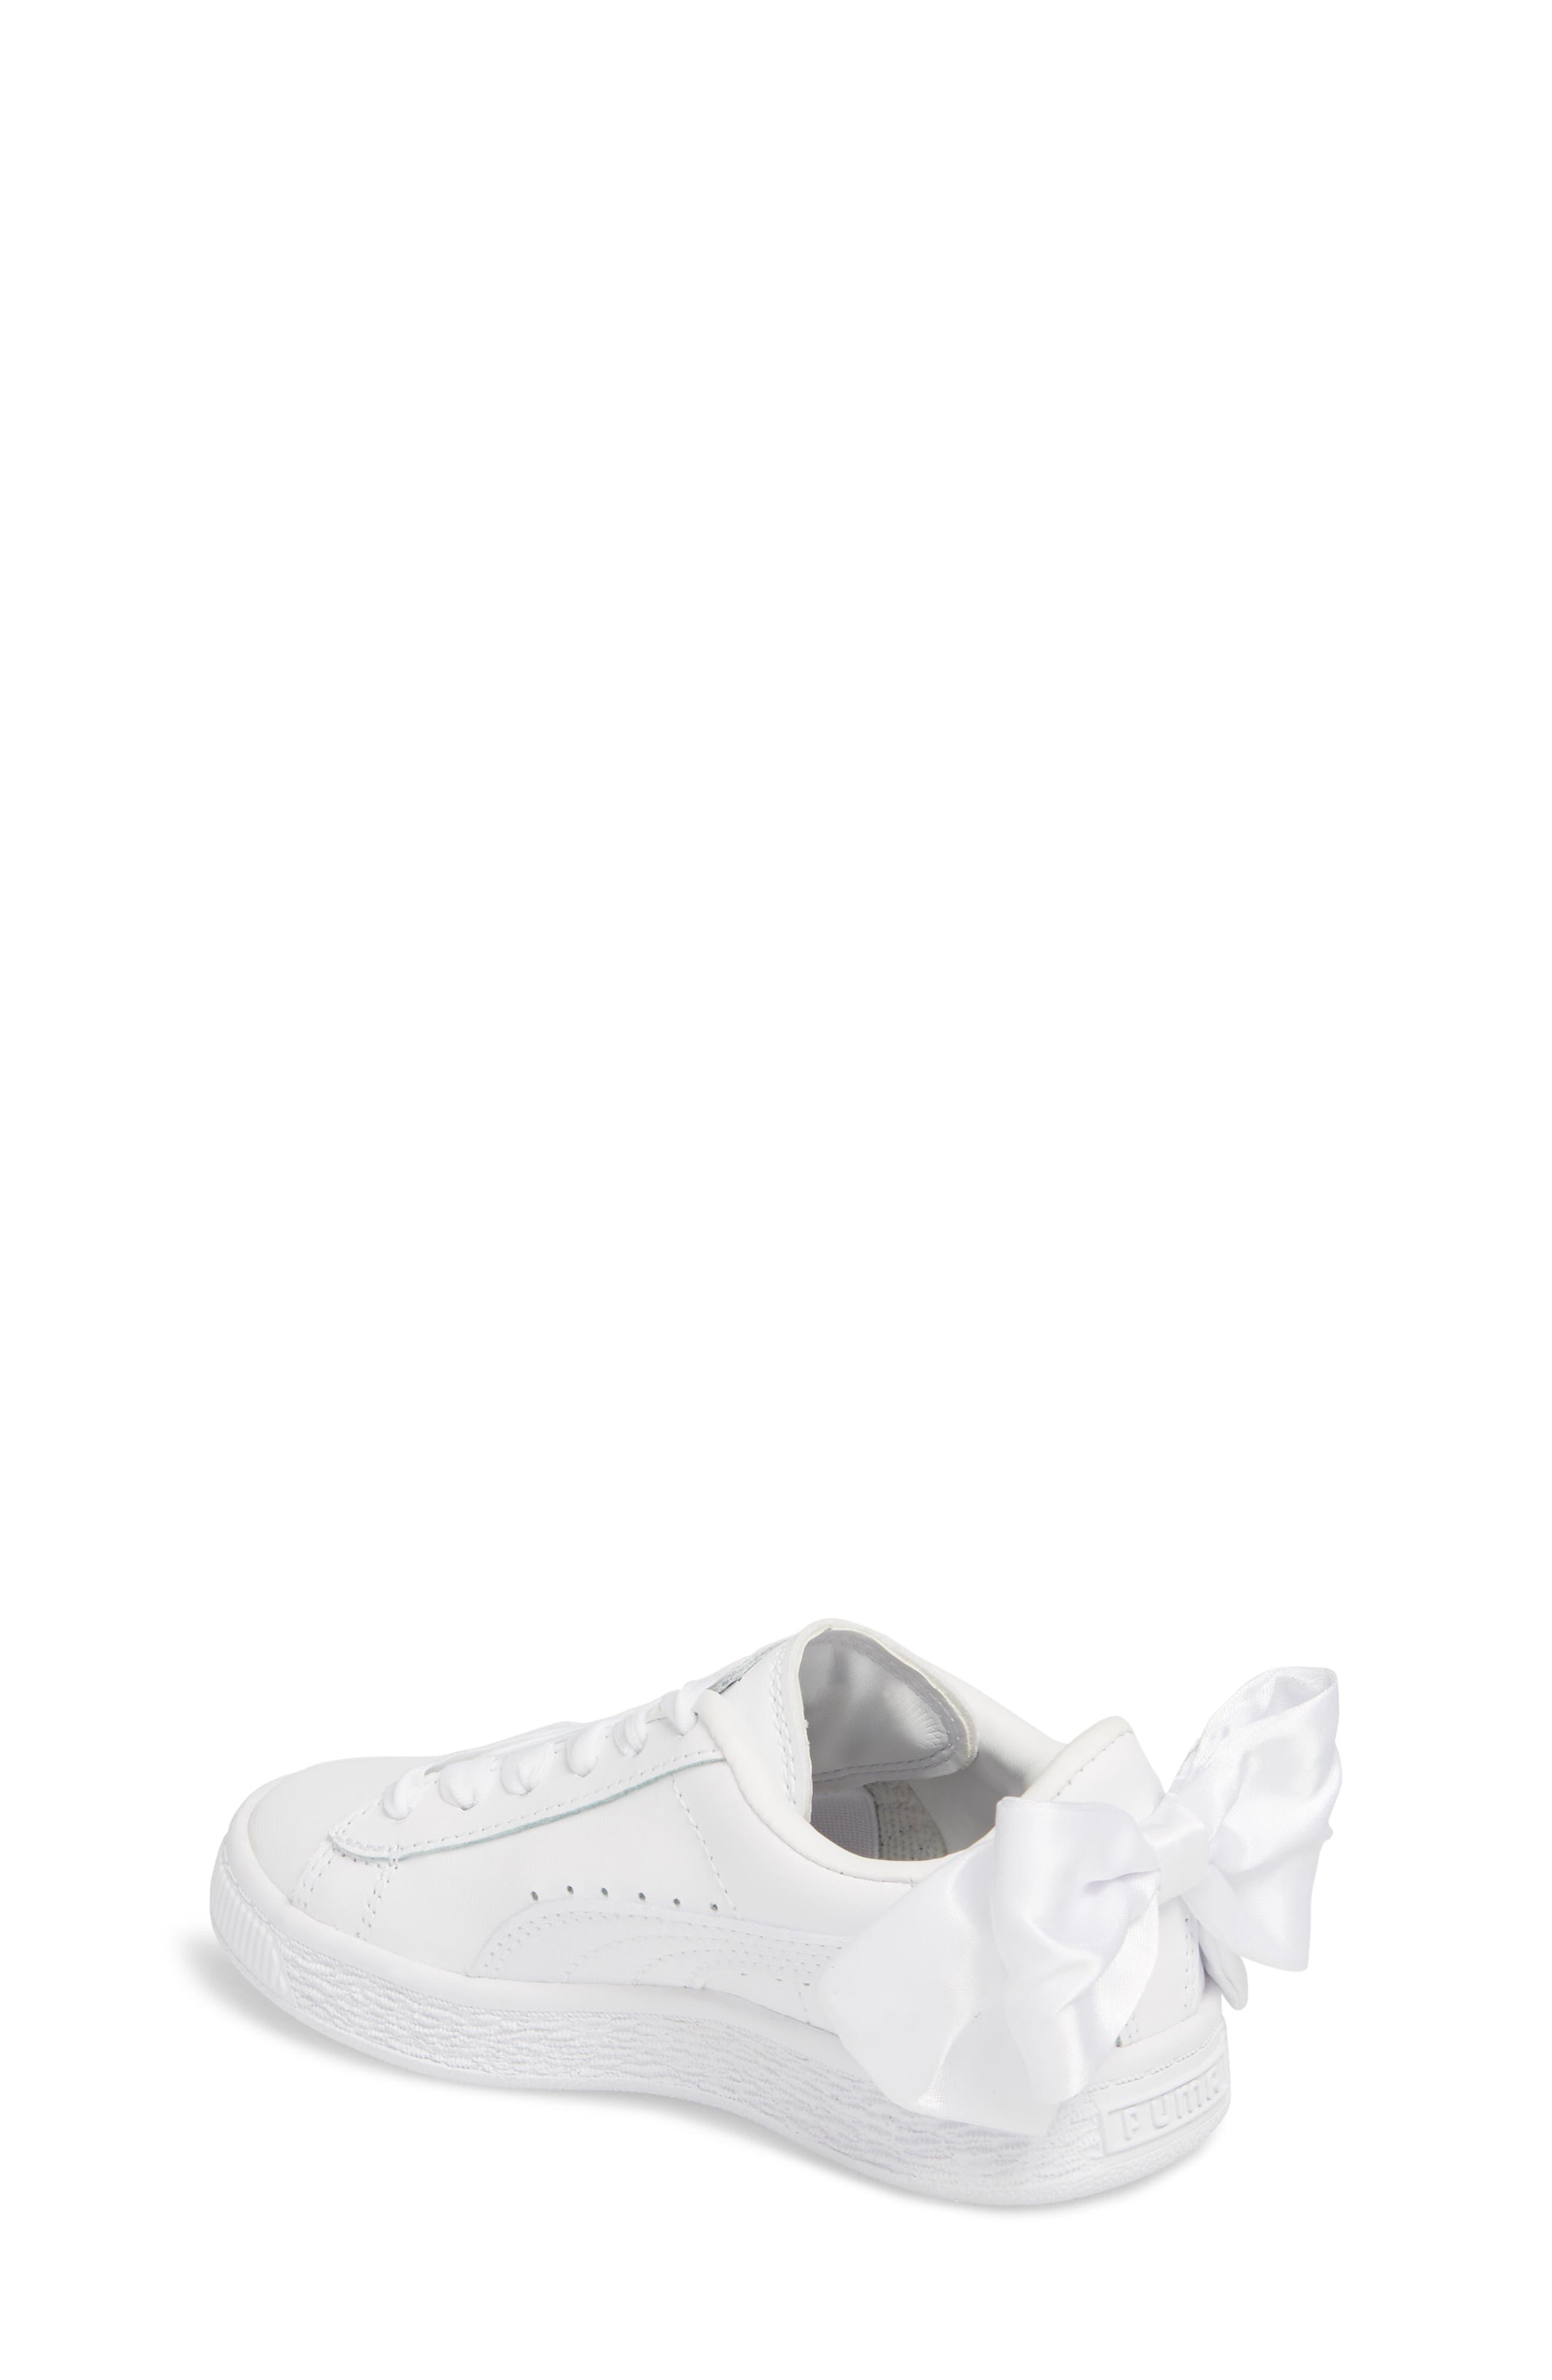 Basket Bow AC Sneaker,                             Alternate thumbnail 2, color,                             100